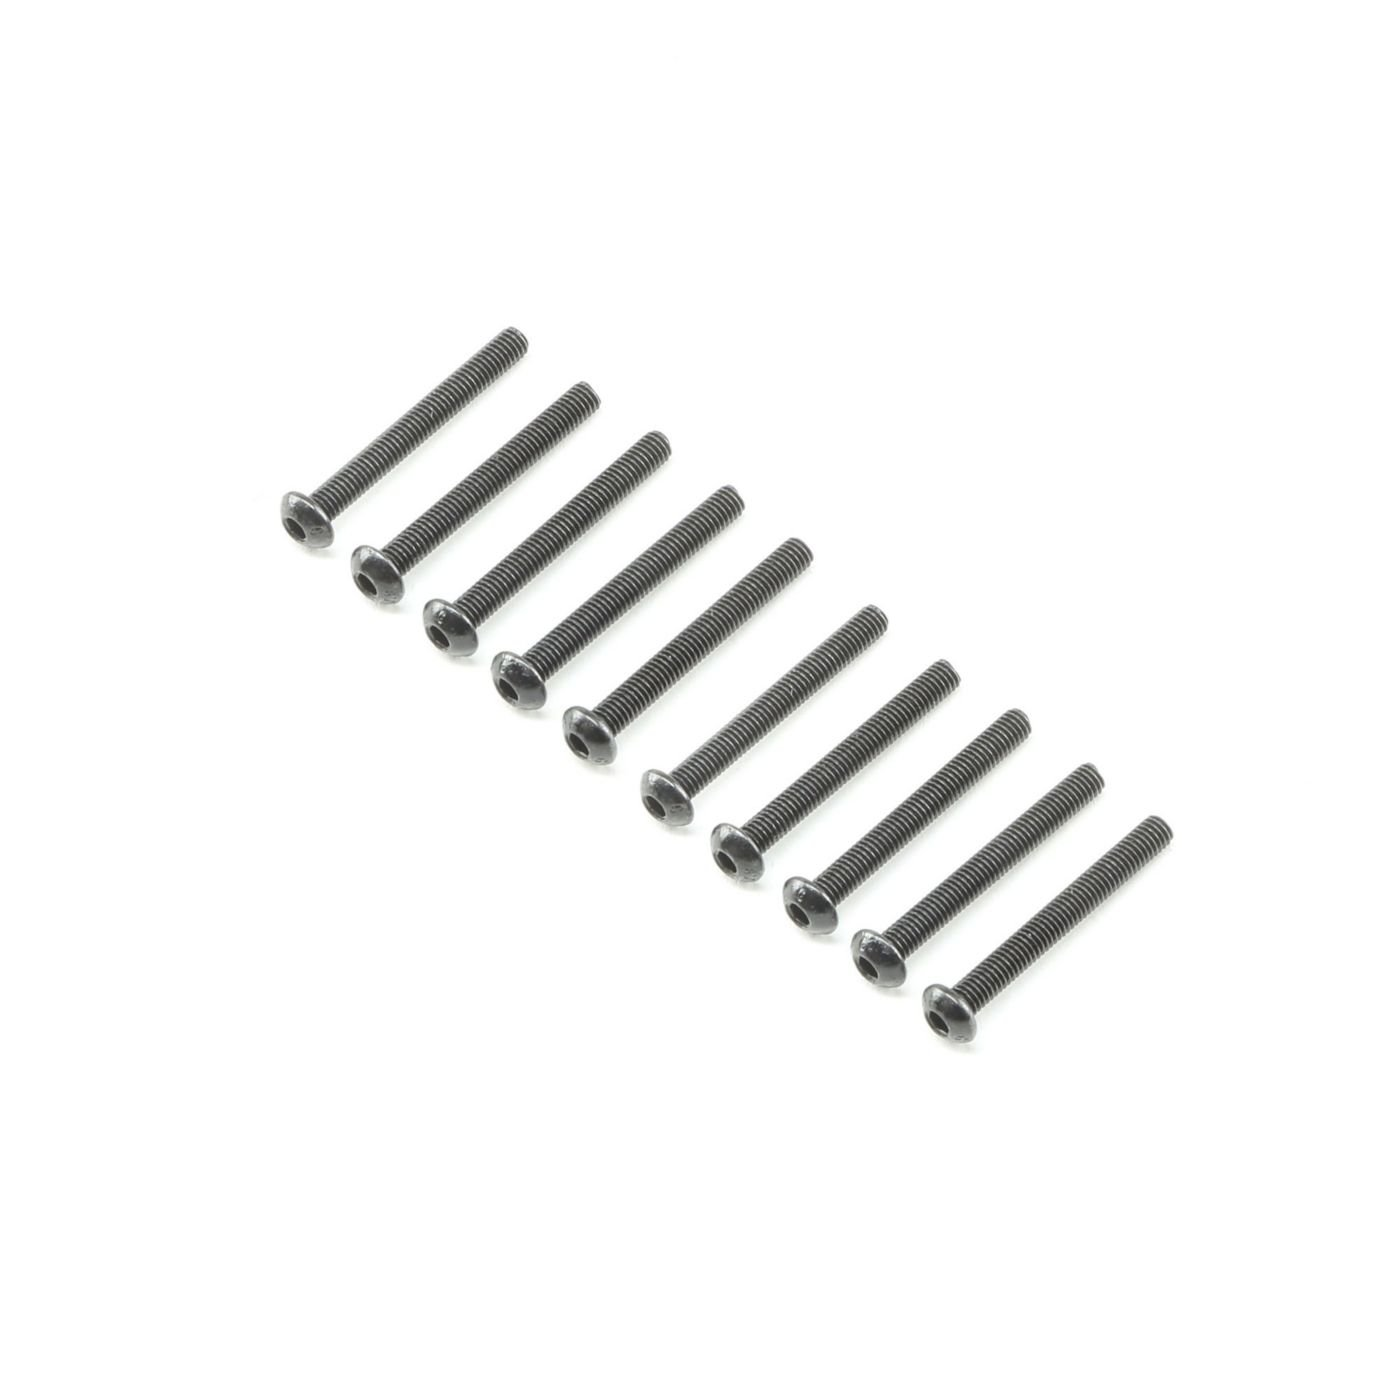 TLR Heavy Duty Brake Pads 8 /& 8T 4.0 TLR242023